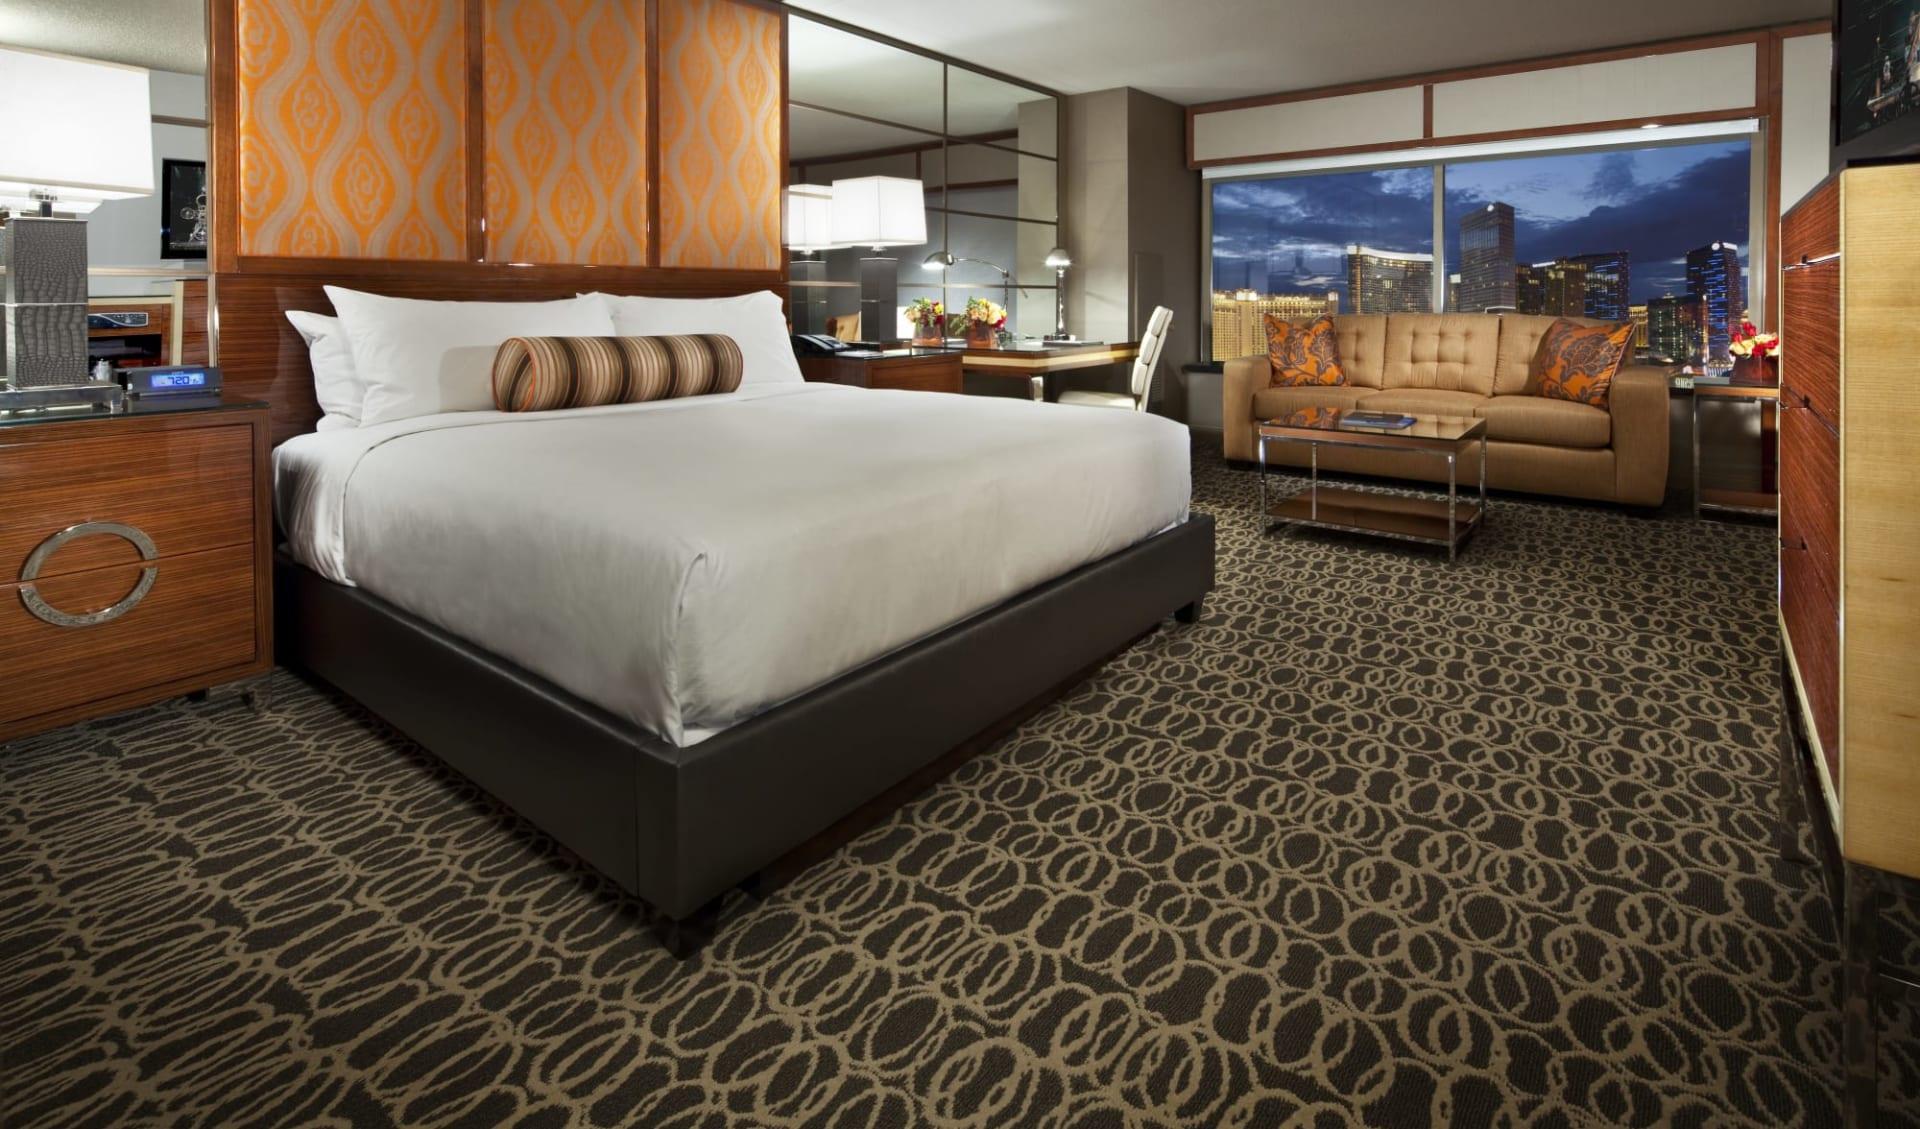 MGM Grand Hotel in Las Vegas:  MGM Grand - Grand Room